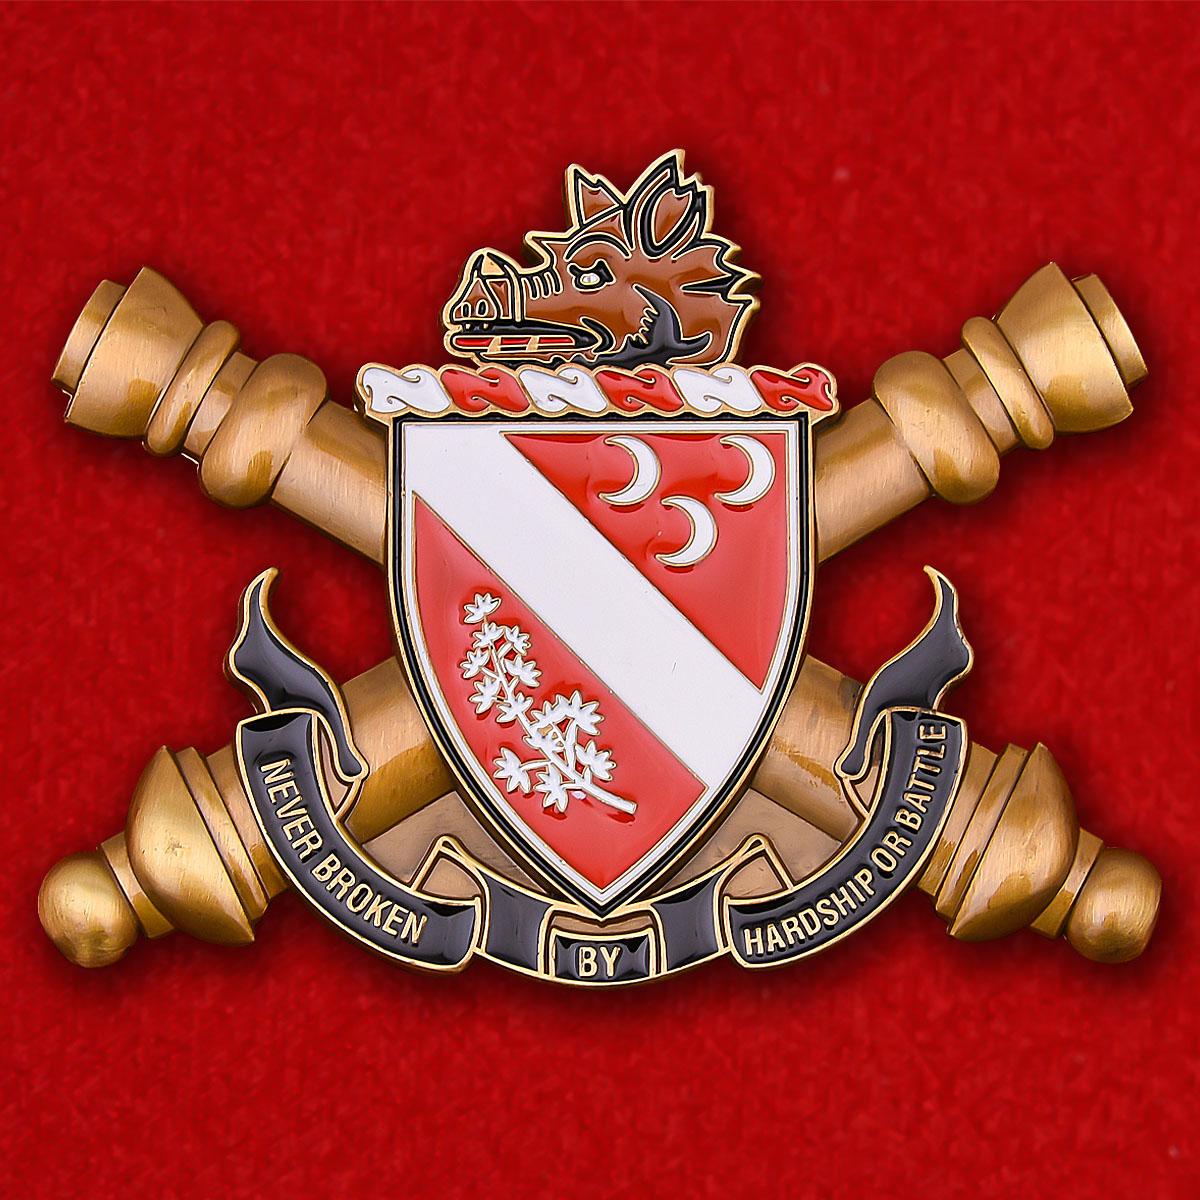 Челлендж коин 7-го полка полевой артиллерии Армии США